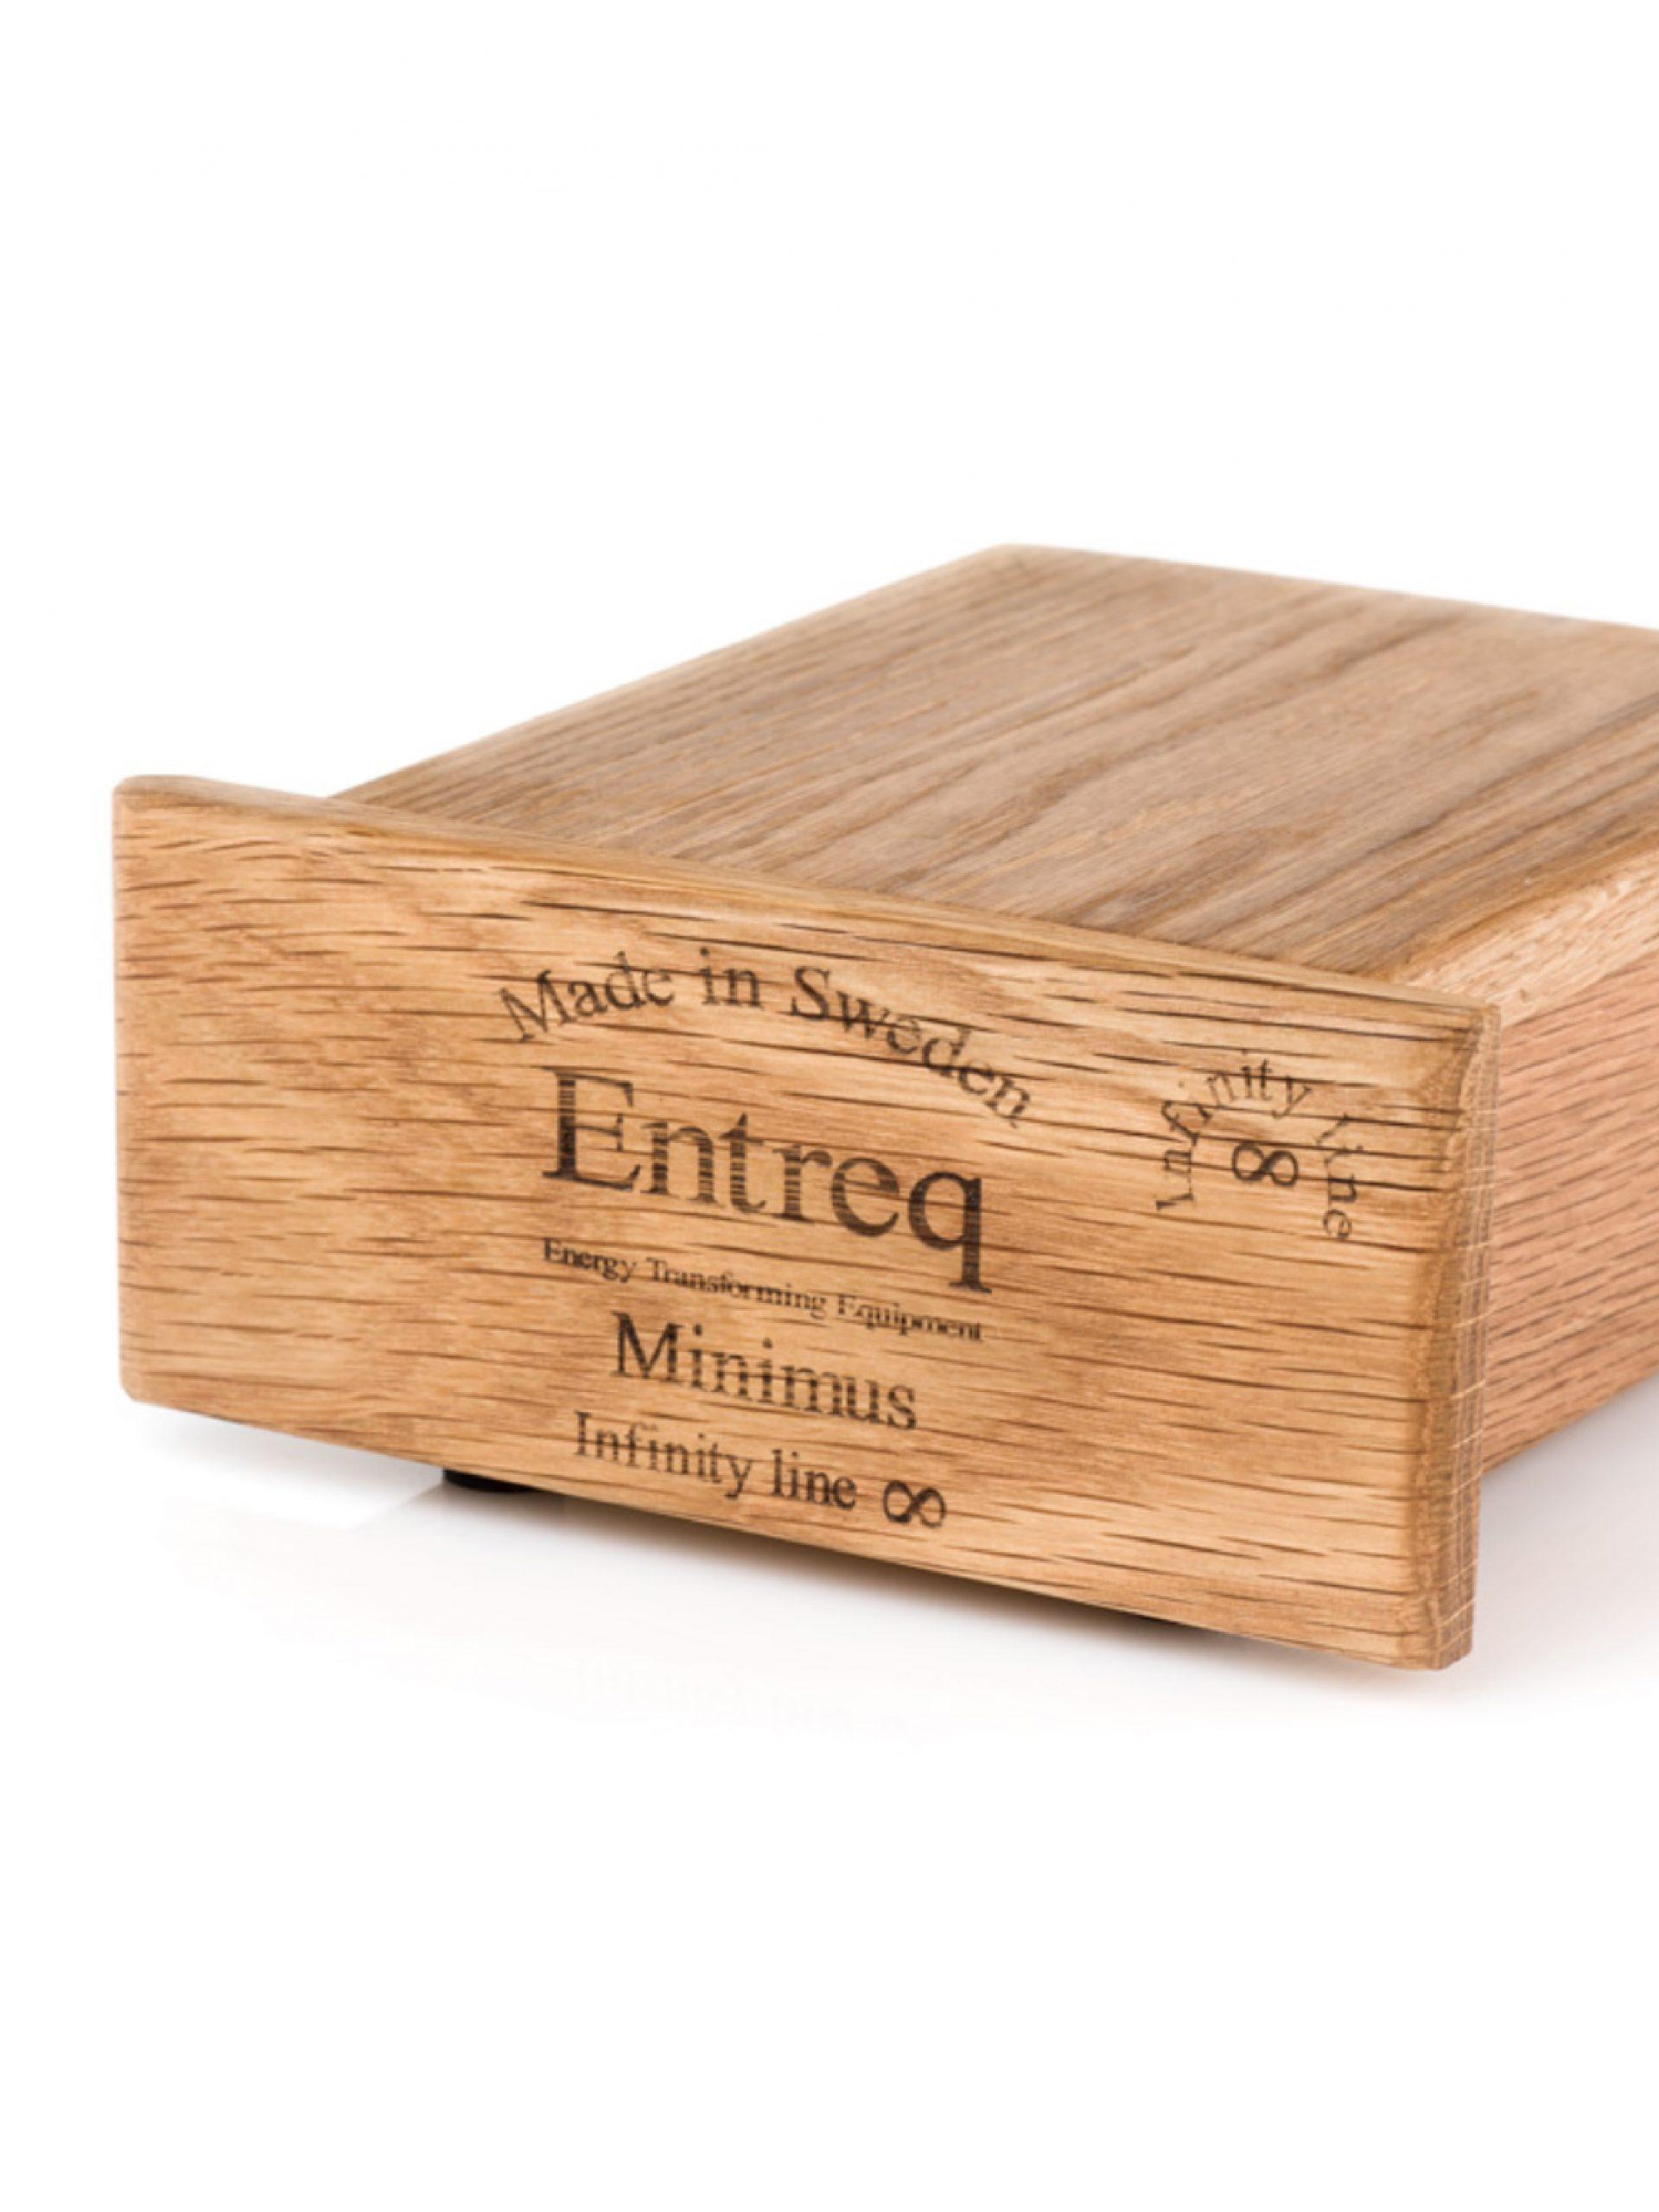 Entreq Minimus Infinity